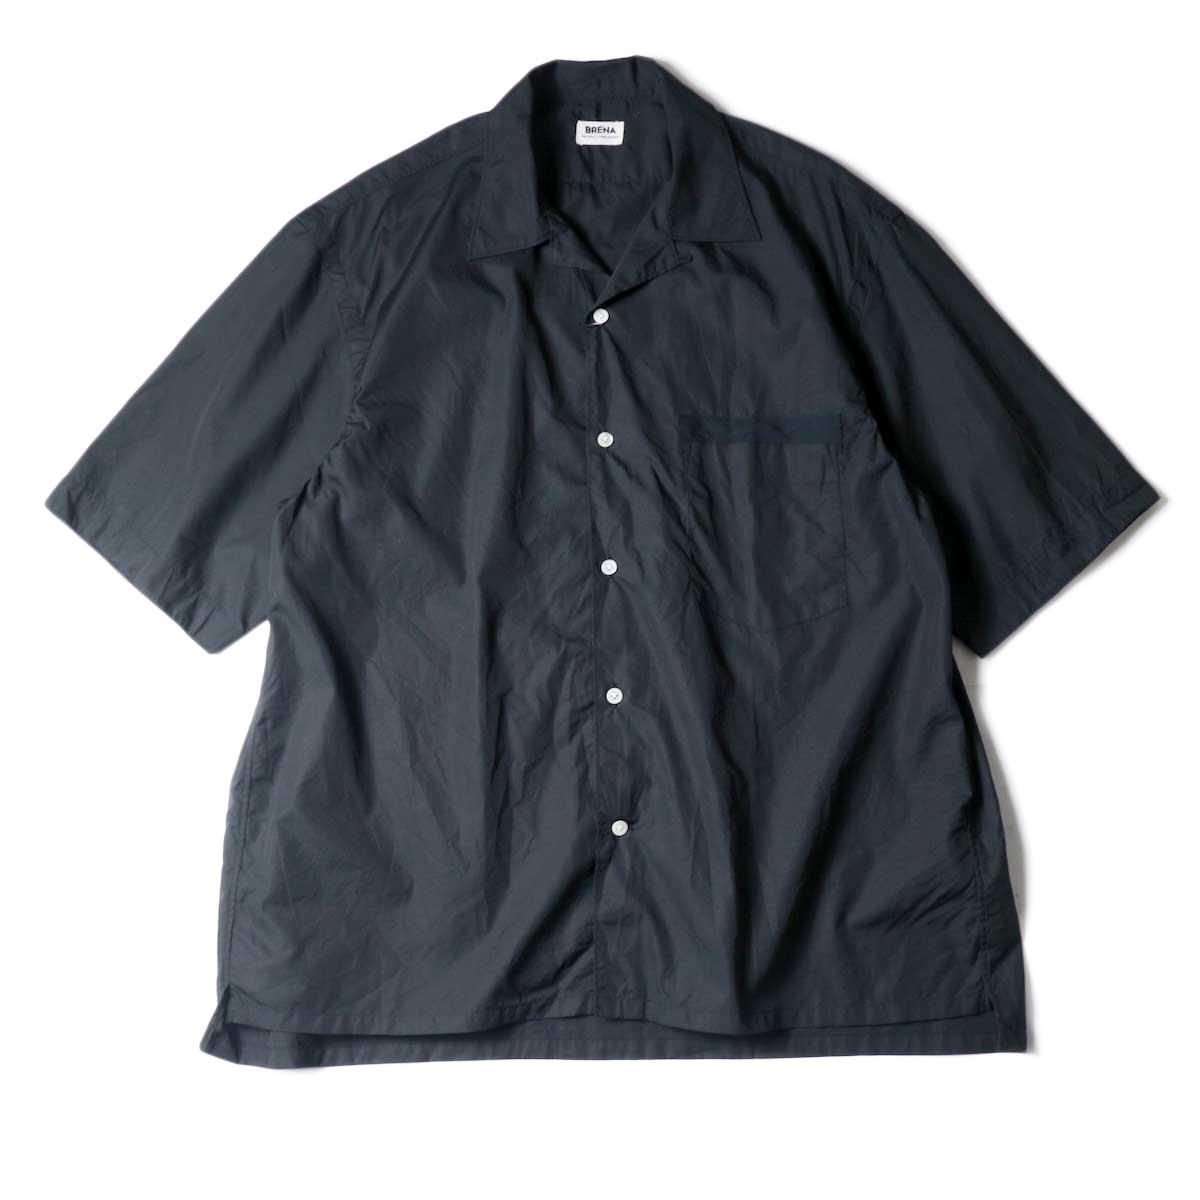 BRENA / OC-SS (Open Collar Shirt) Black